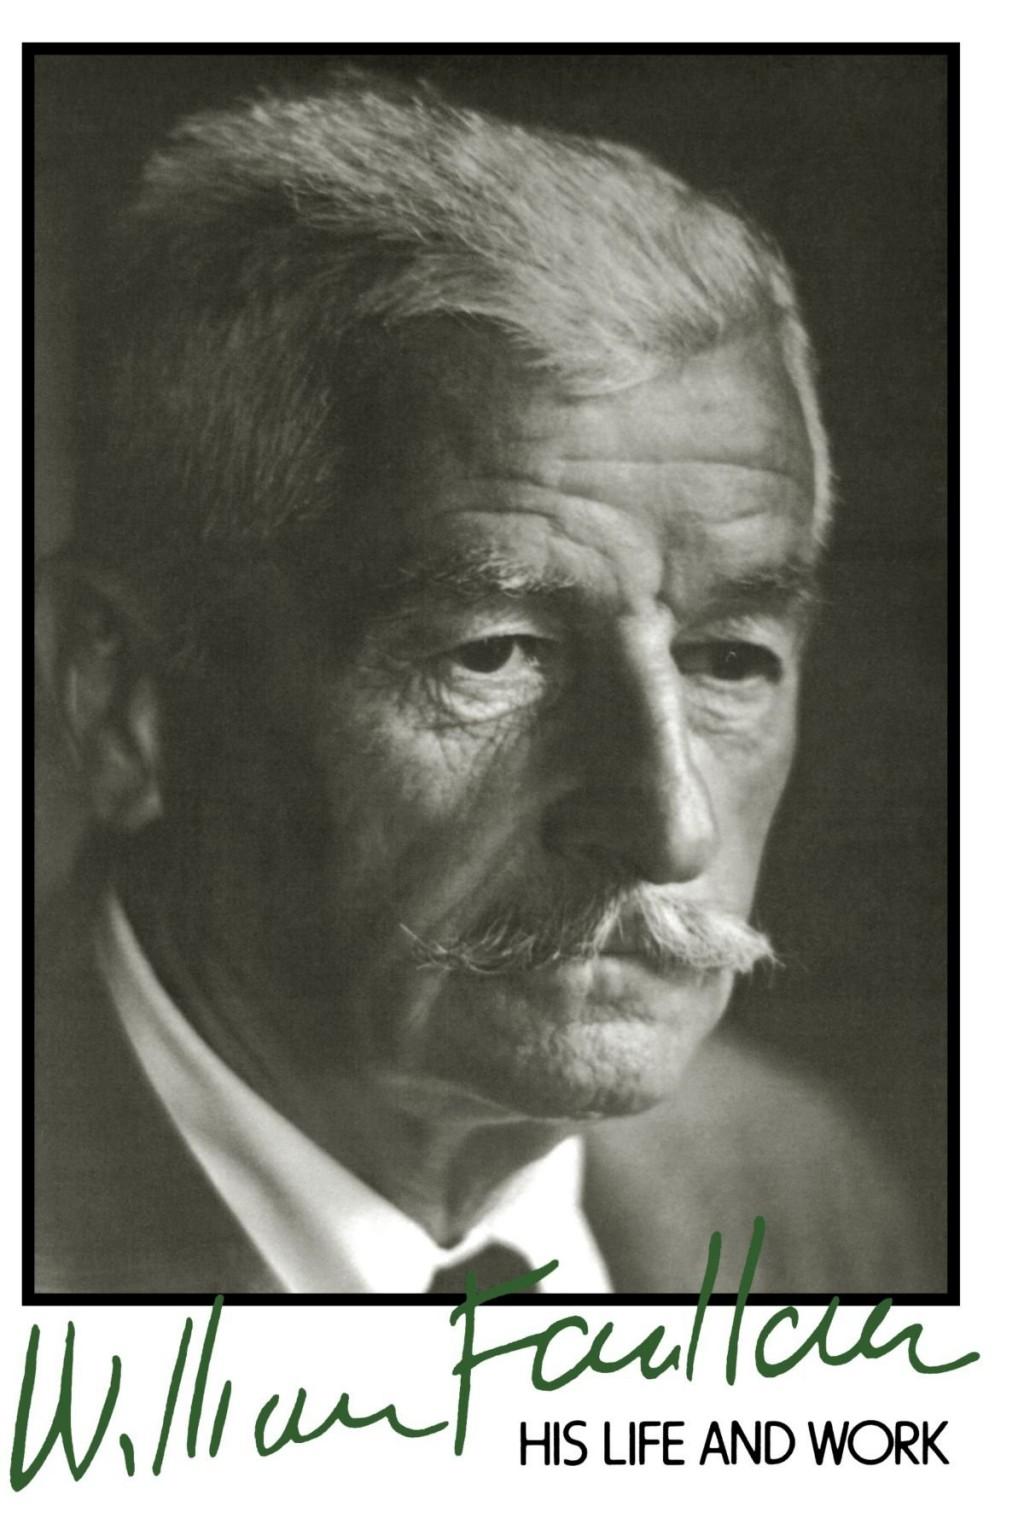 006 71yinu39gil Essay Example William Faulkner Stunning Essays Topics Large